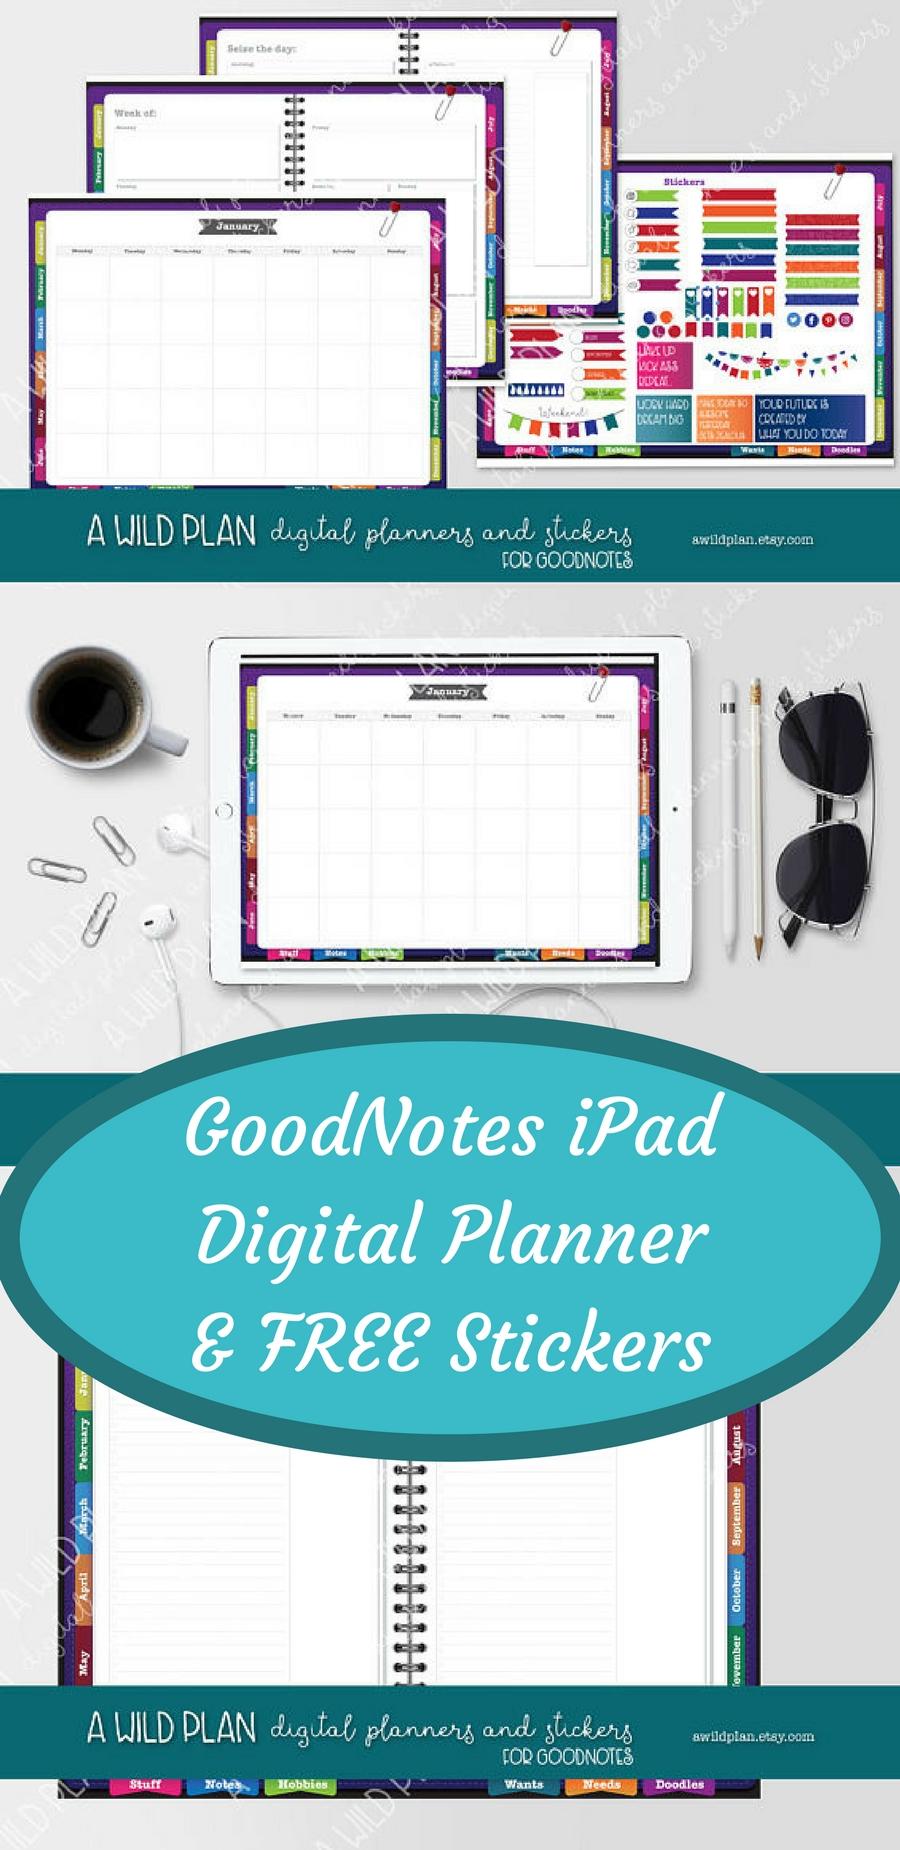 Goodnotes Ipad Digital Planner Plus Free Stickers | Undated